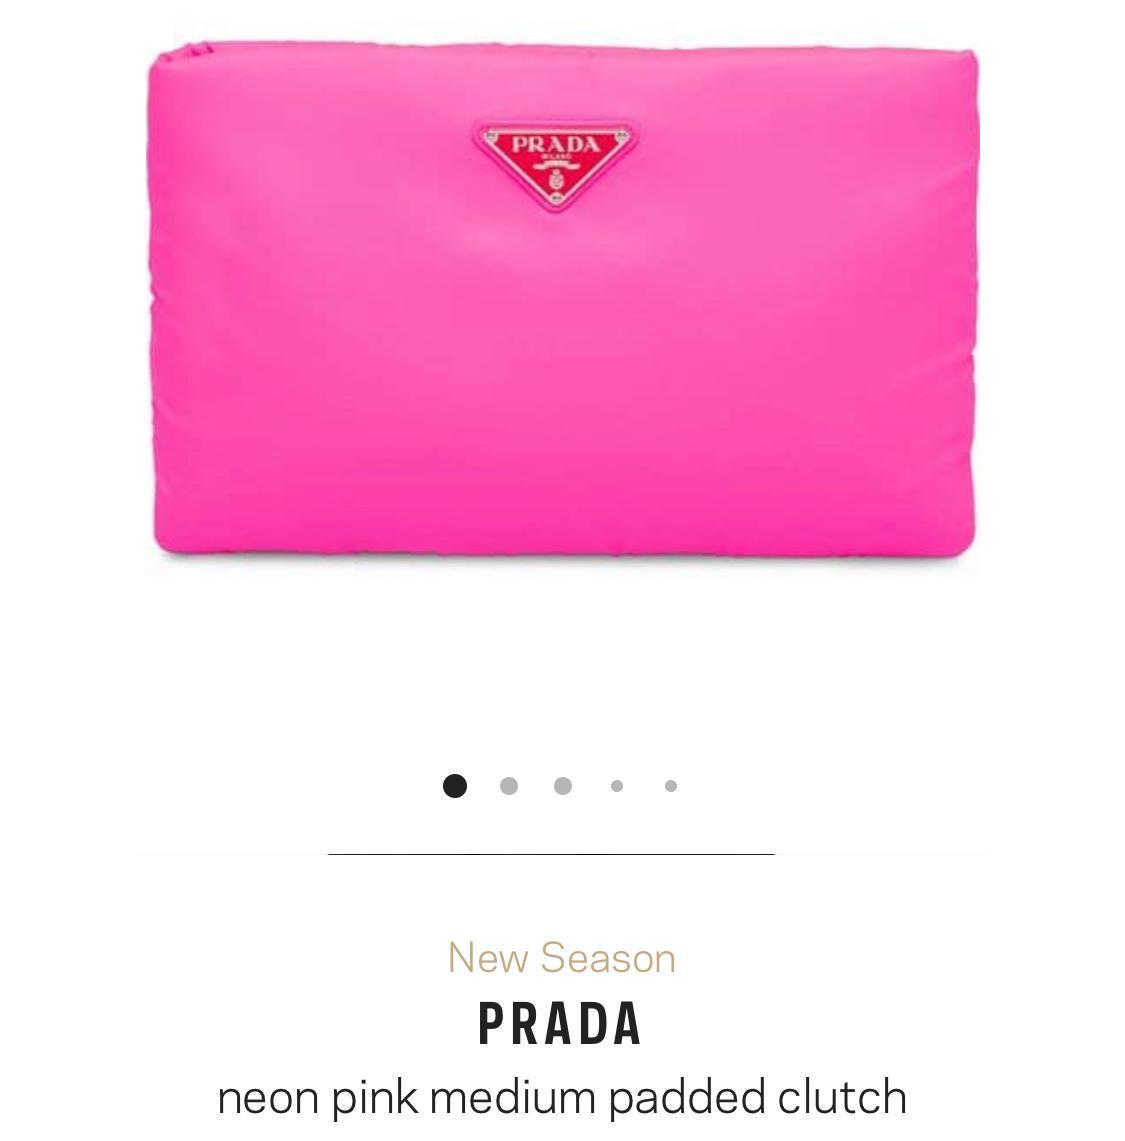 acb6f0e2b4e87f PRADA neon pink medium padded clutch | The Volte